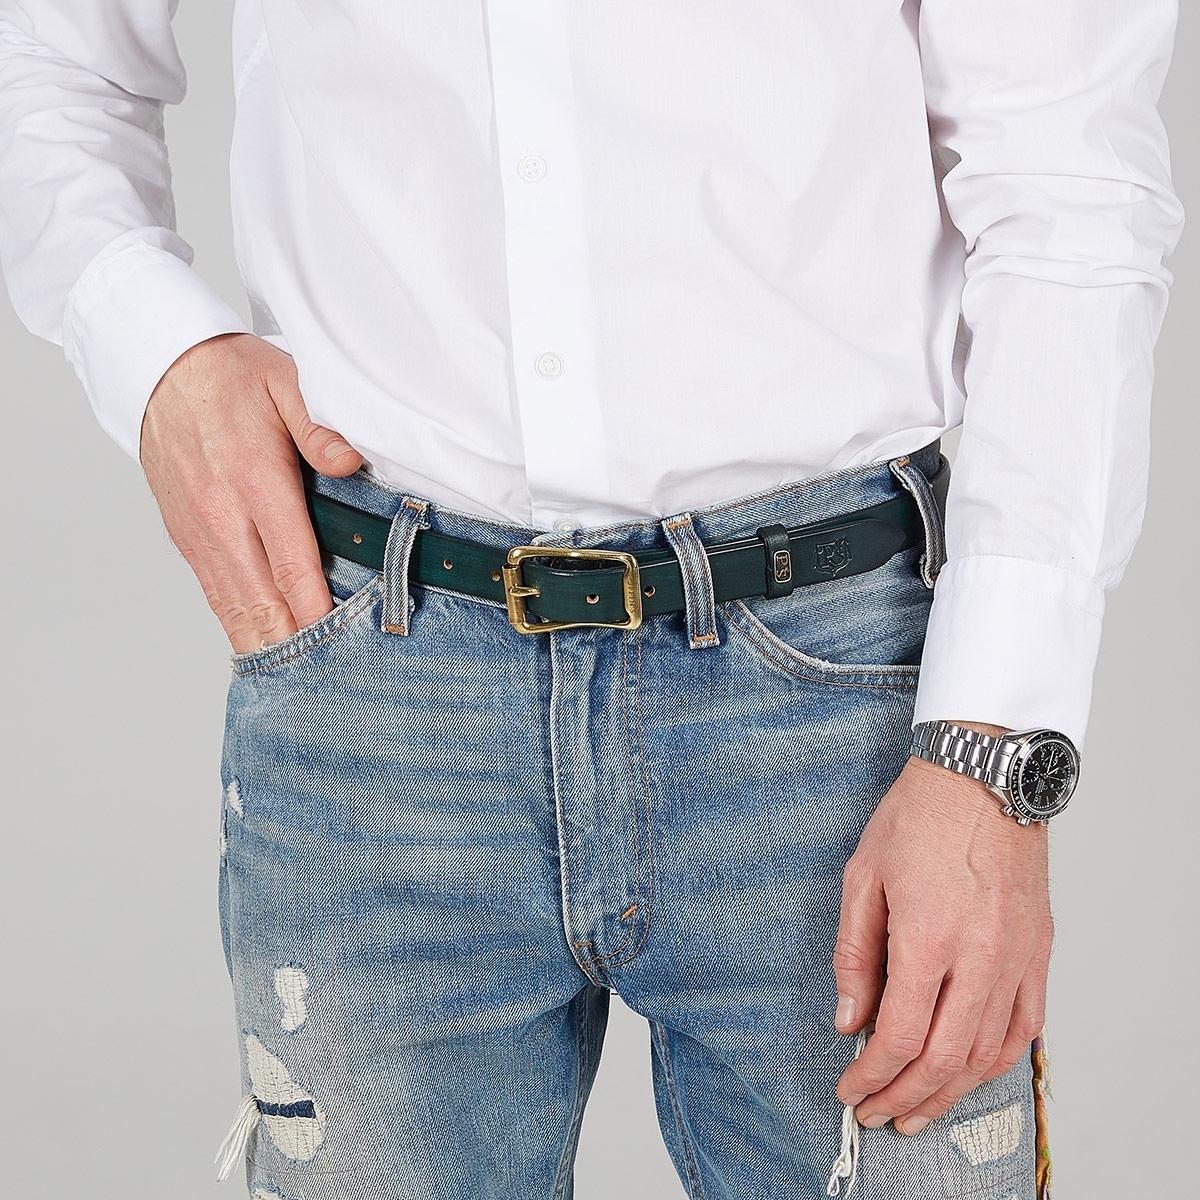 Luxury narrow belt 25mm with patina bluemarine